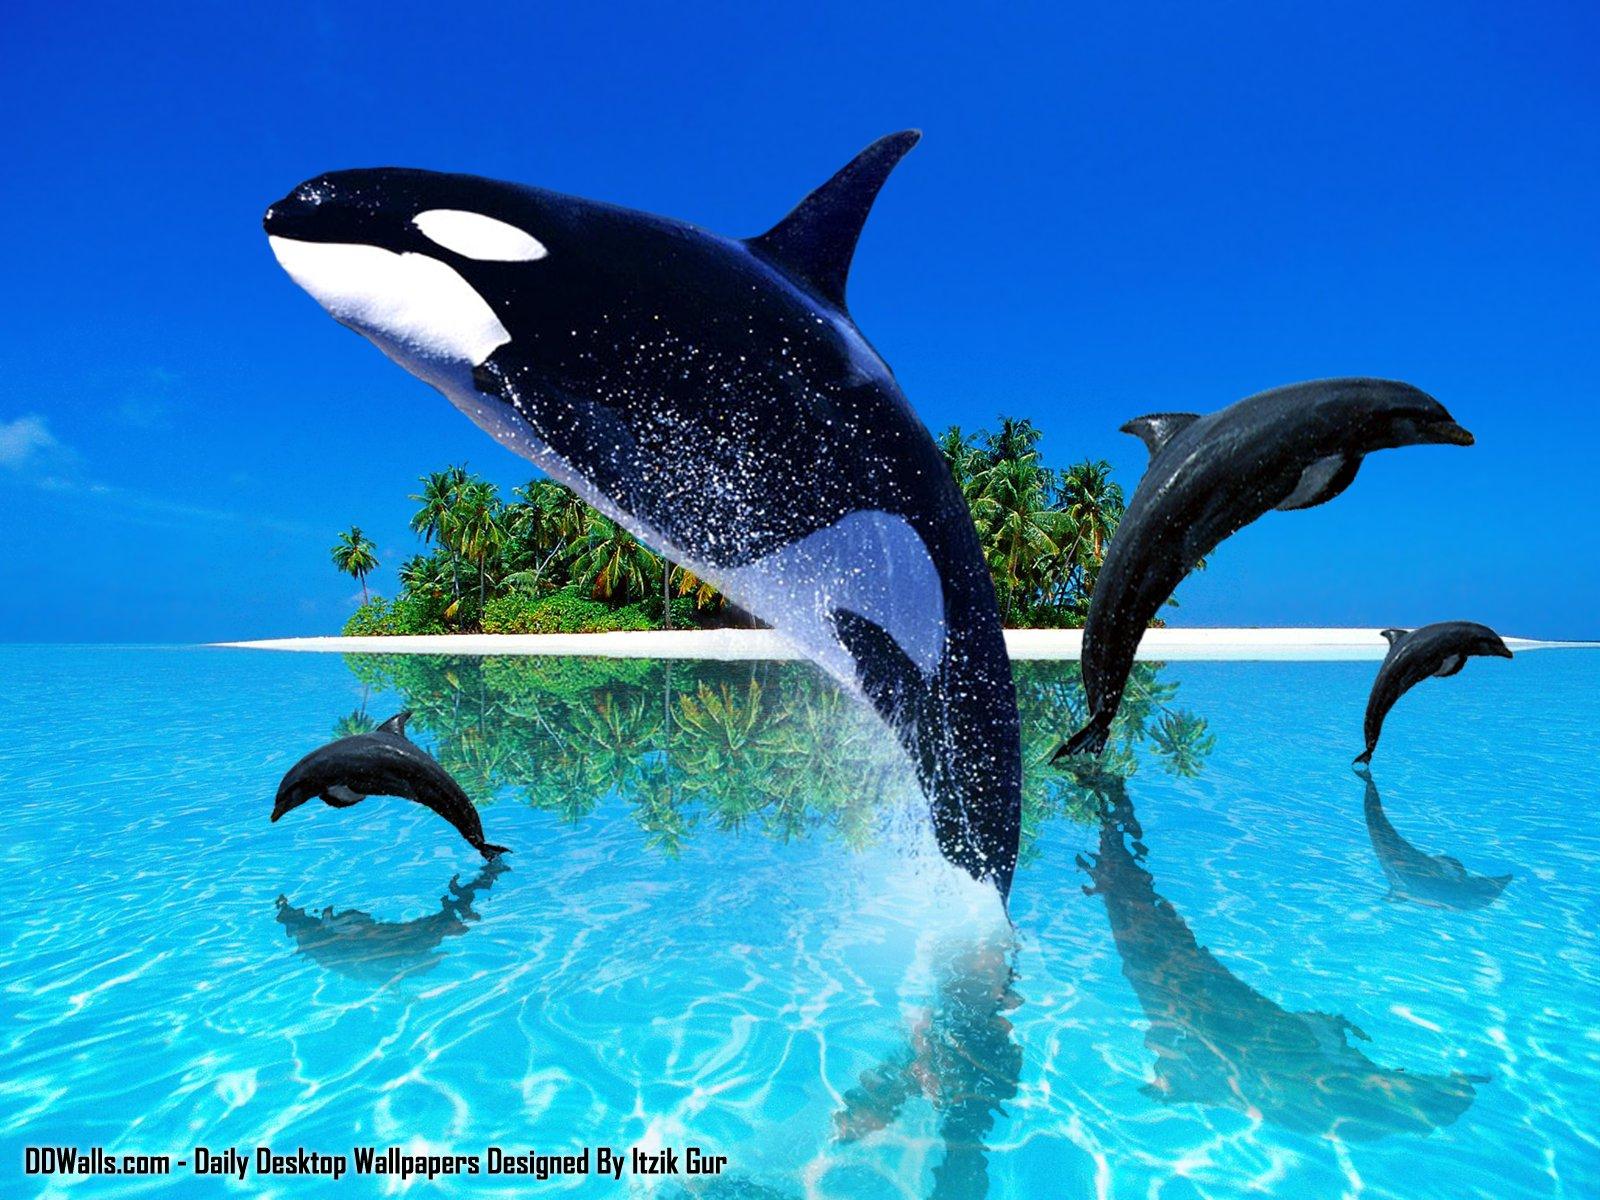 http://3.bp.blogspot.com/-h9QkDdkMl1E/T-ezLbzb8AI/AAAAAAAAAFI/LJfIkJpDPE4/s1600/animales-47del.jpg